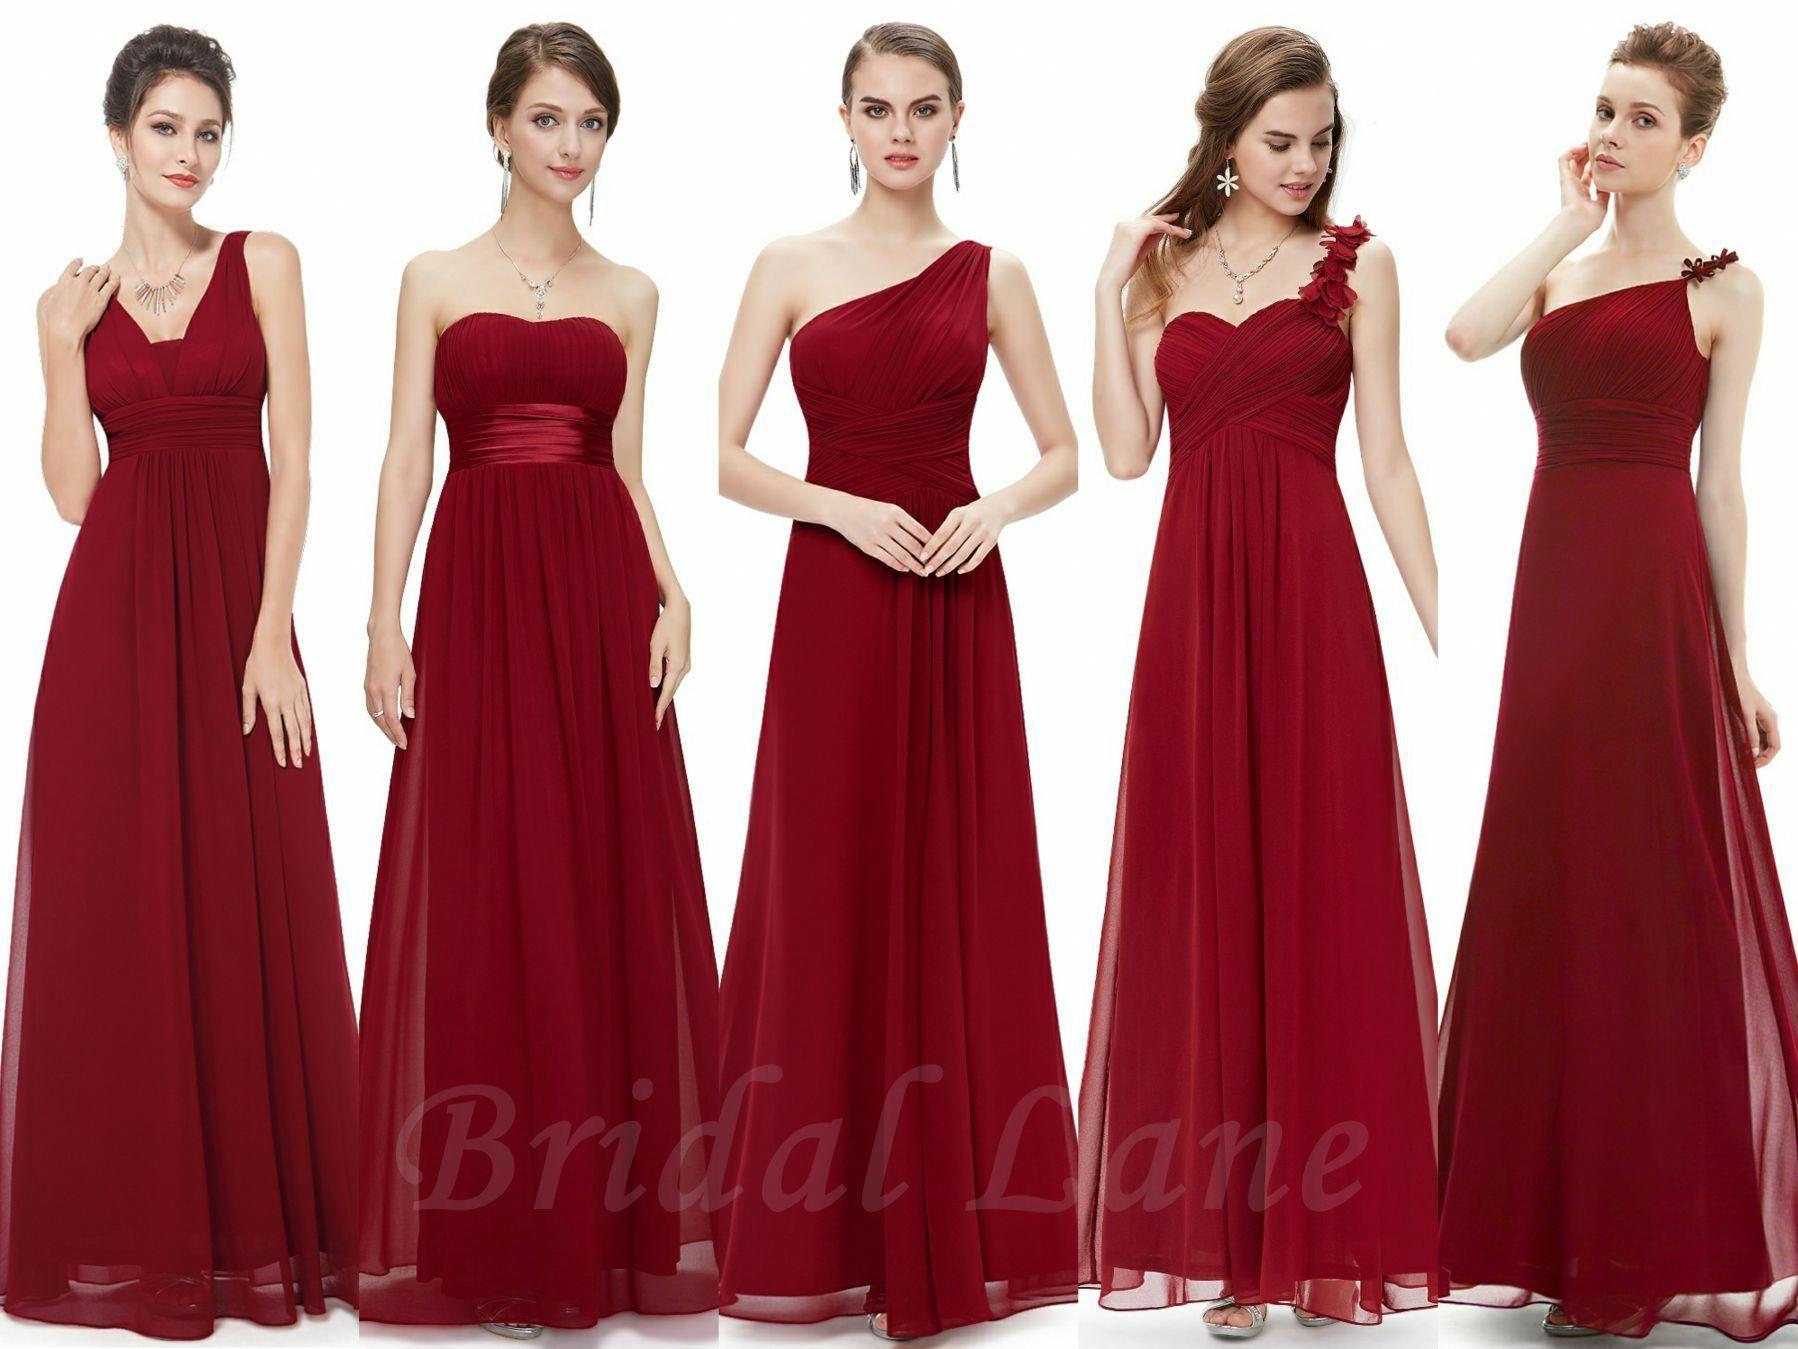 Burgundy Wine Red Bridesmaid Dresses Bridal Lane Cape Town Bluebridesmaiddressesi Red Bridesmaid Dresses Wine Red Bridesmaid Dresses Red Wedding Dresses